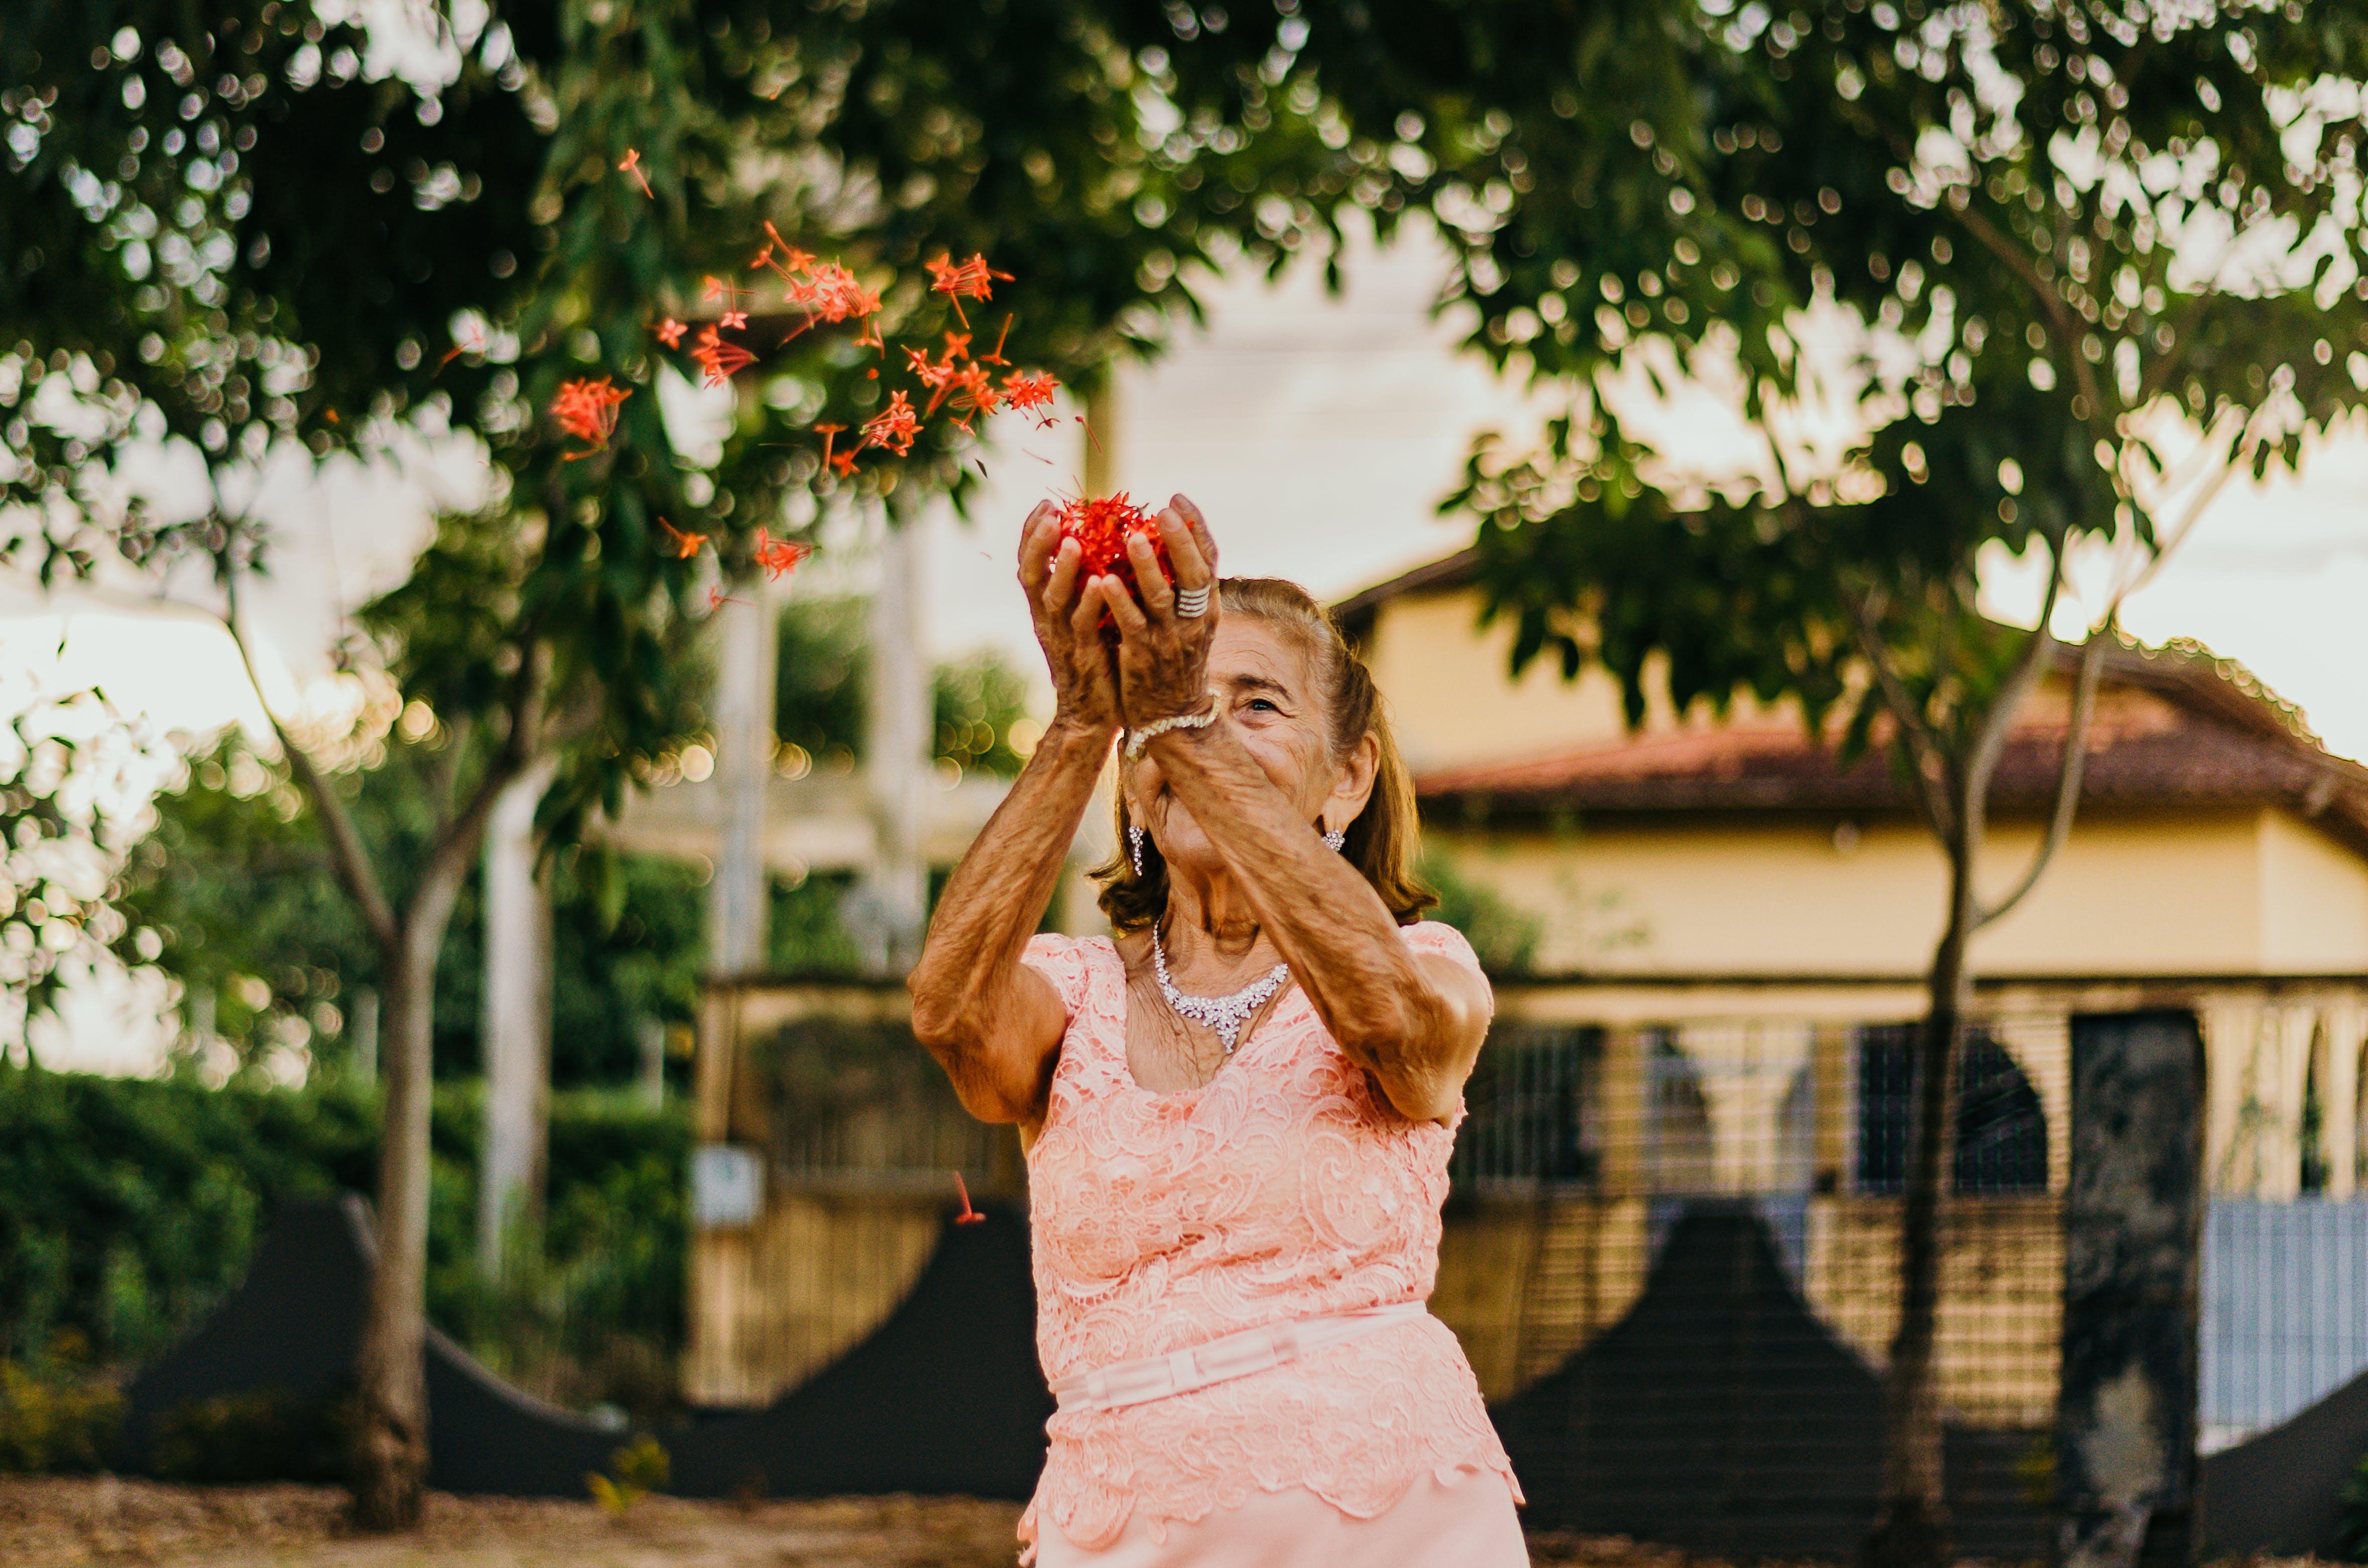 Woman in Pink Dress Throwing Flowers